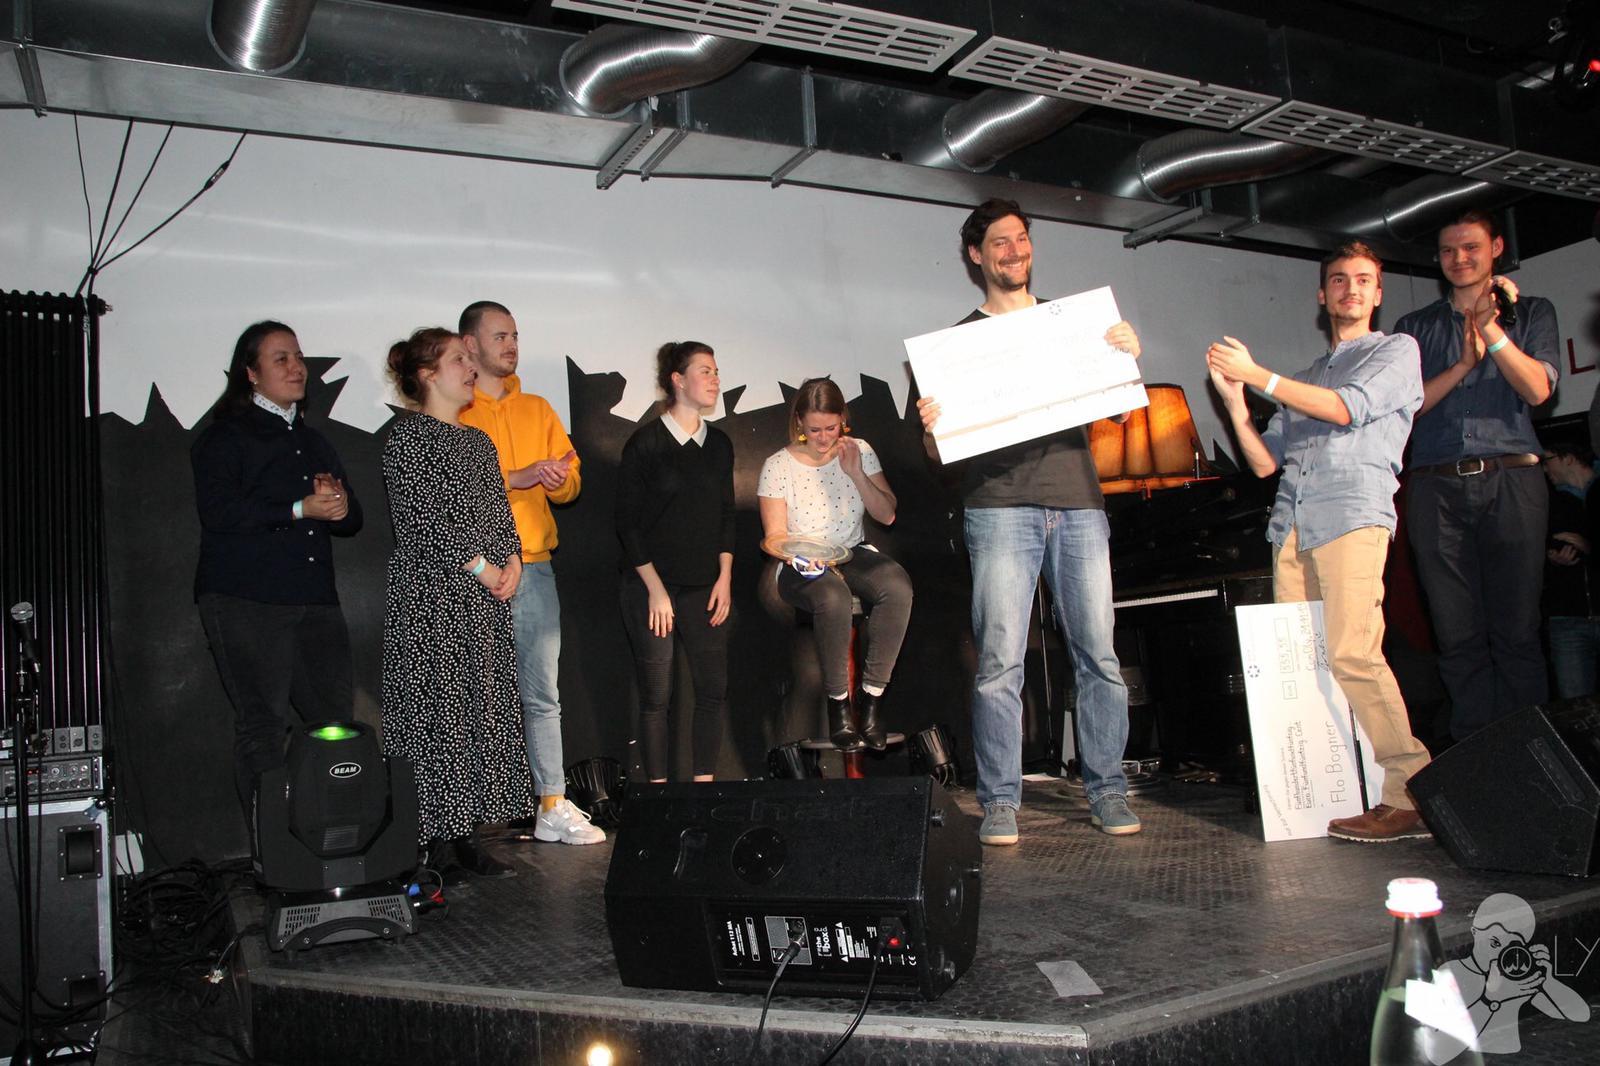 [:de]Der Kleinkunstpreis ComOly 2019[:]